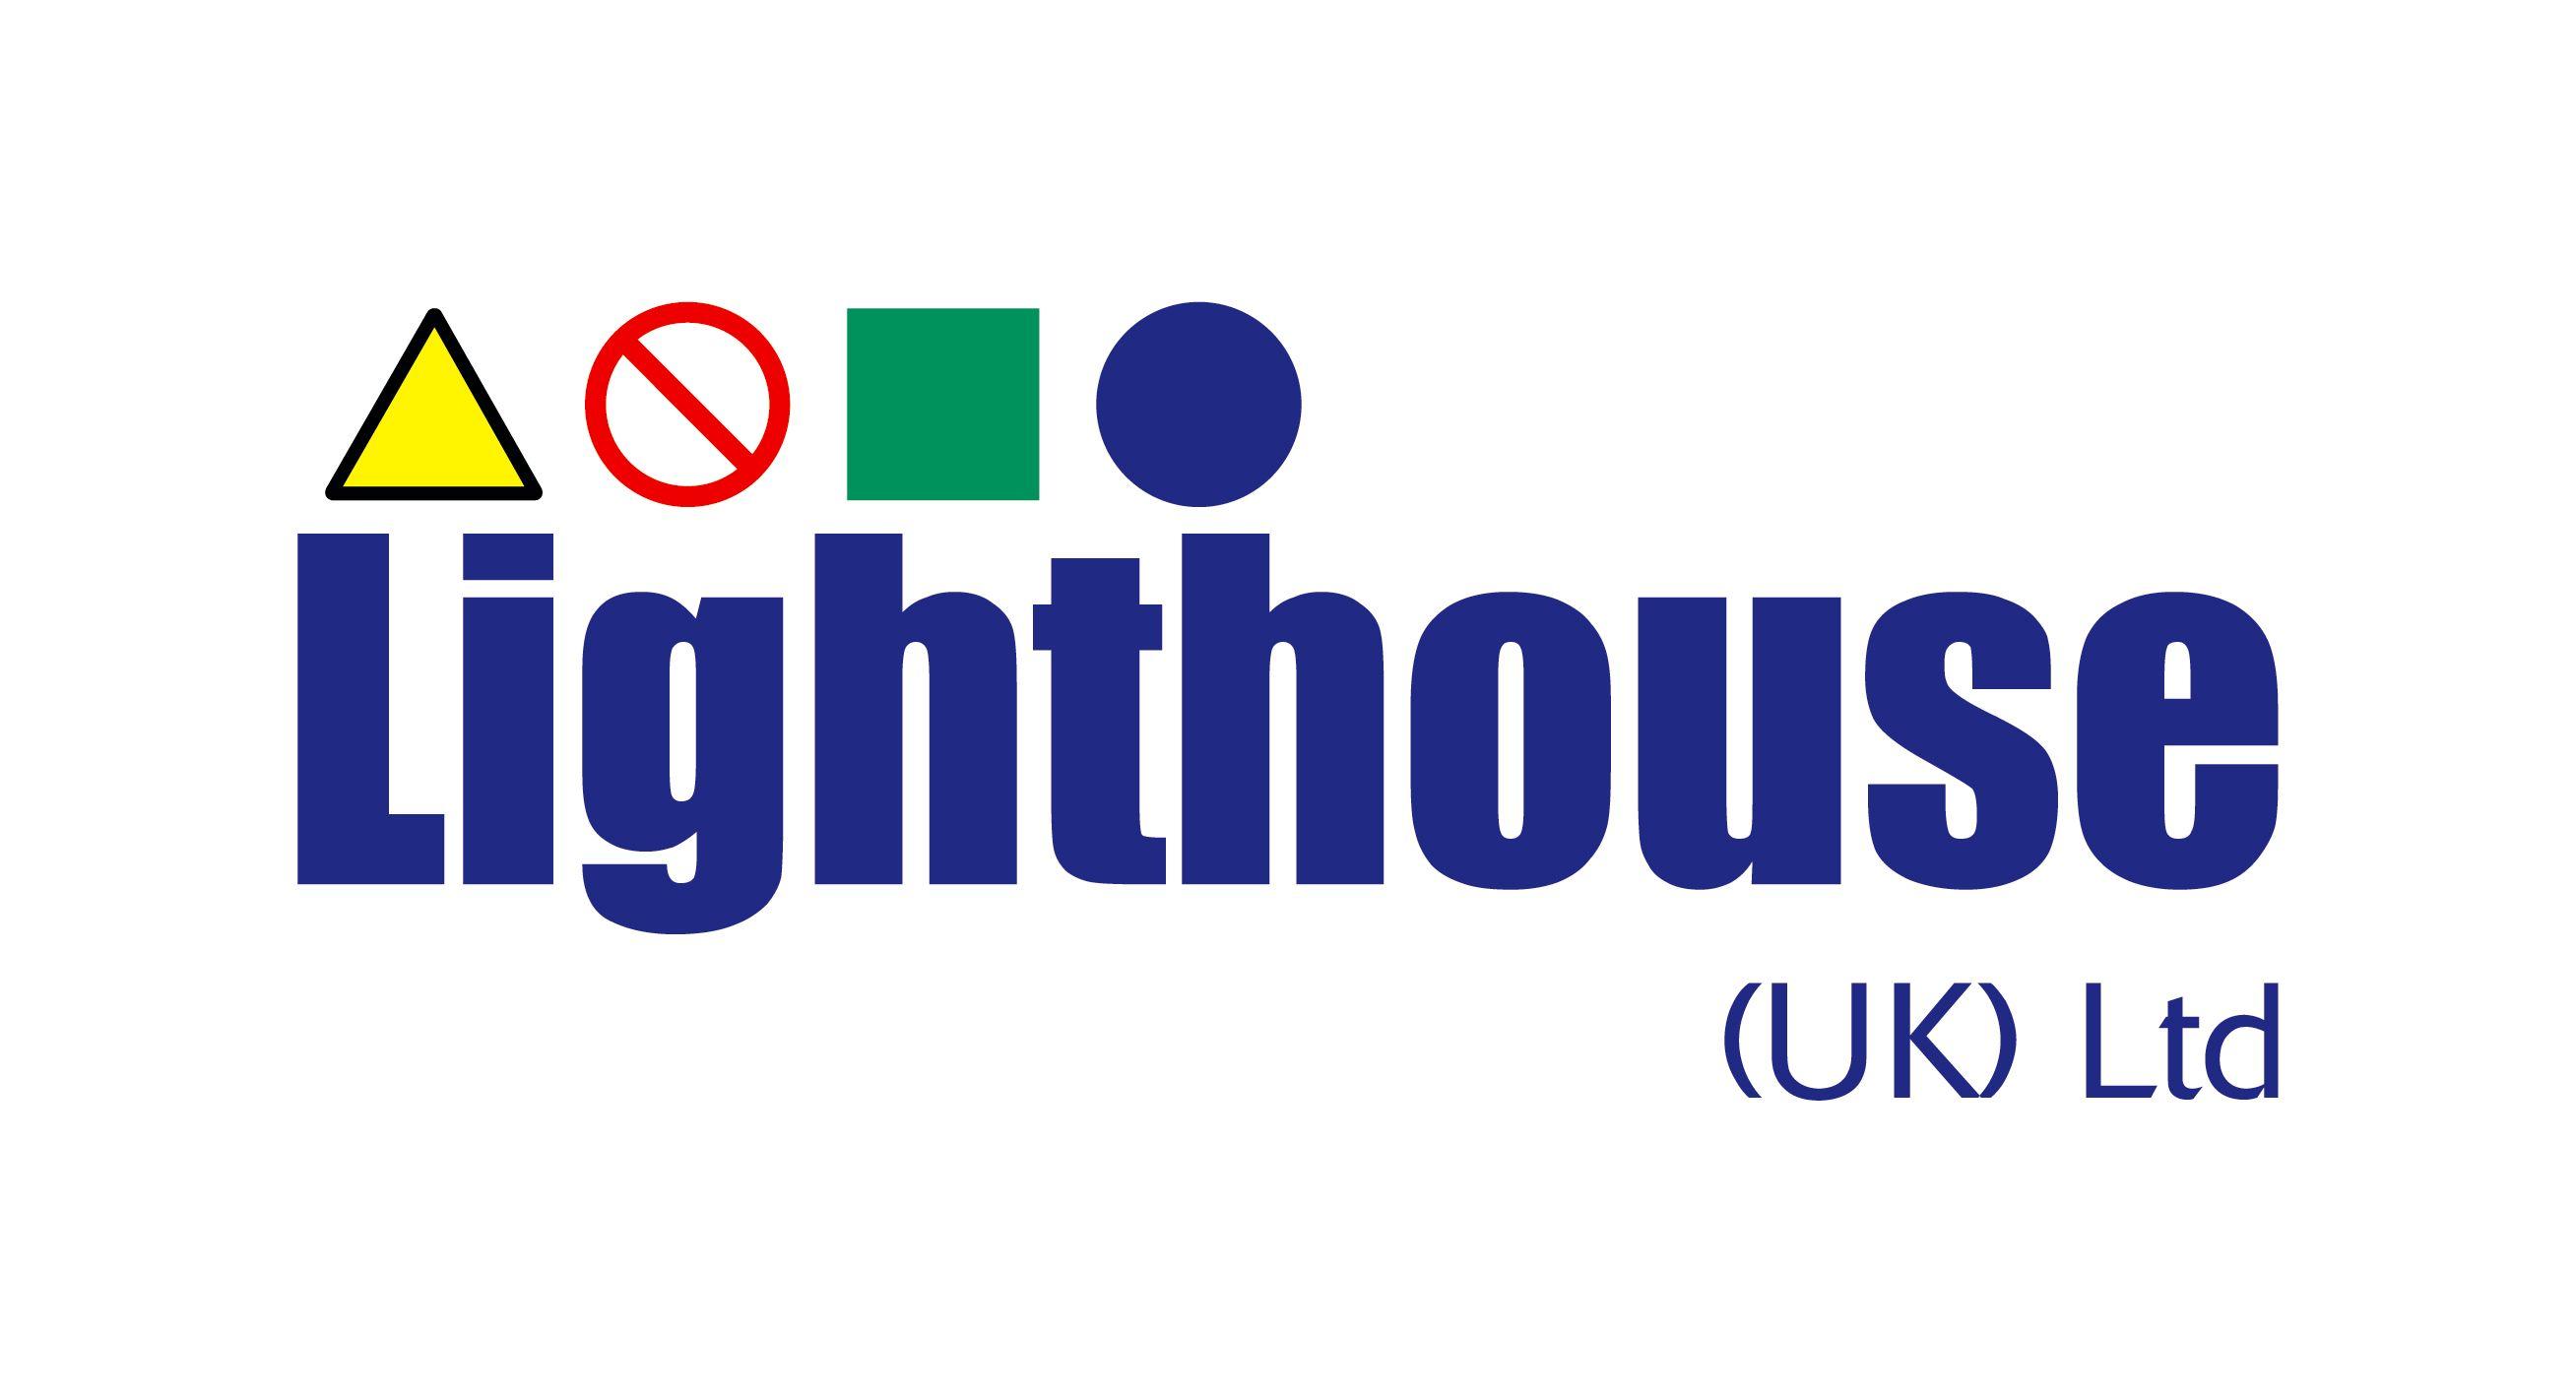 Lighthouse (UK) Ltd